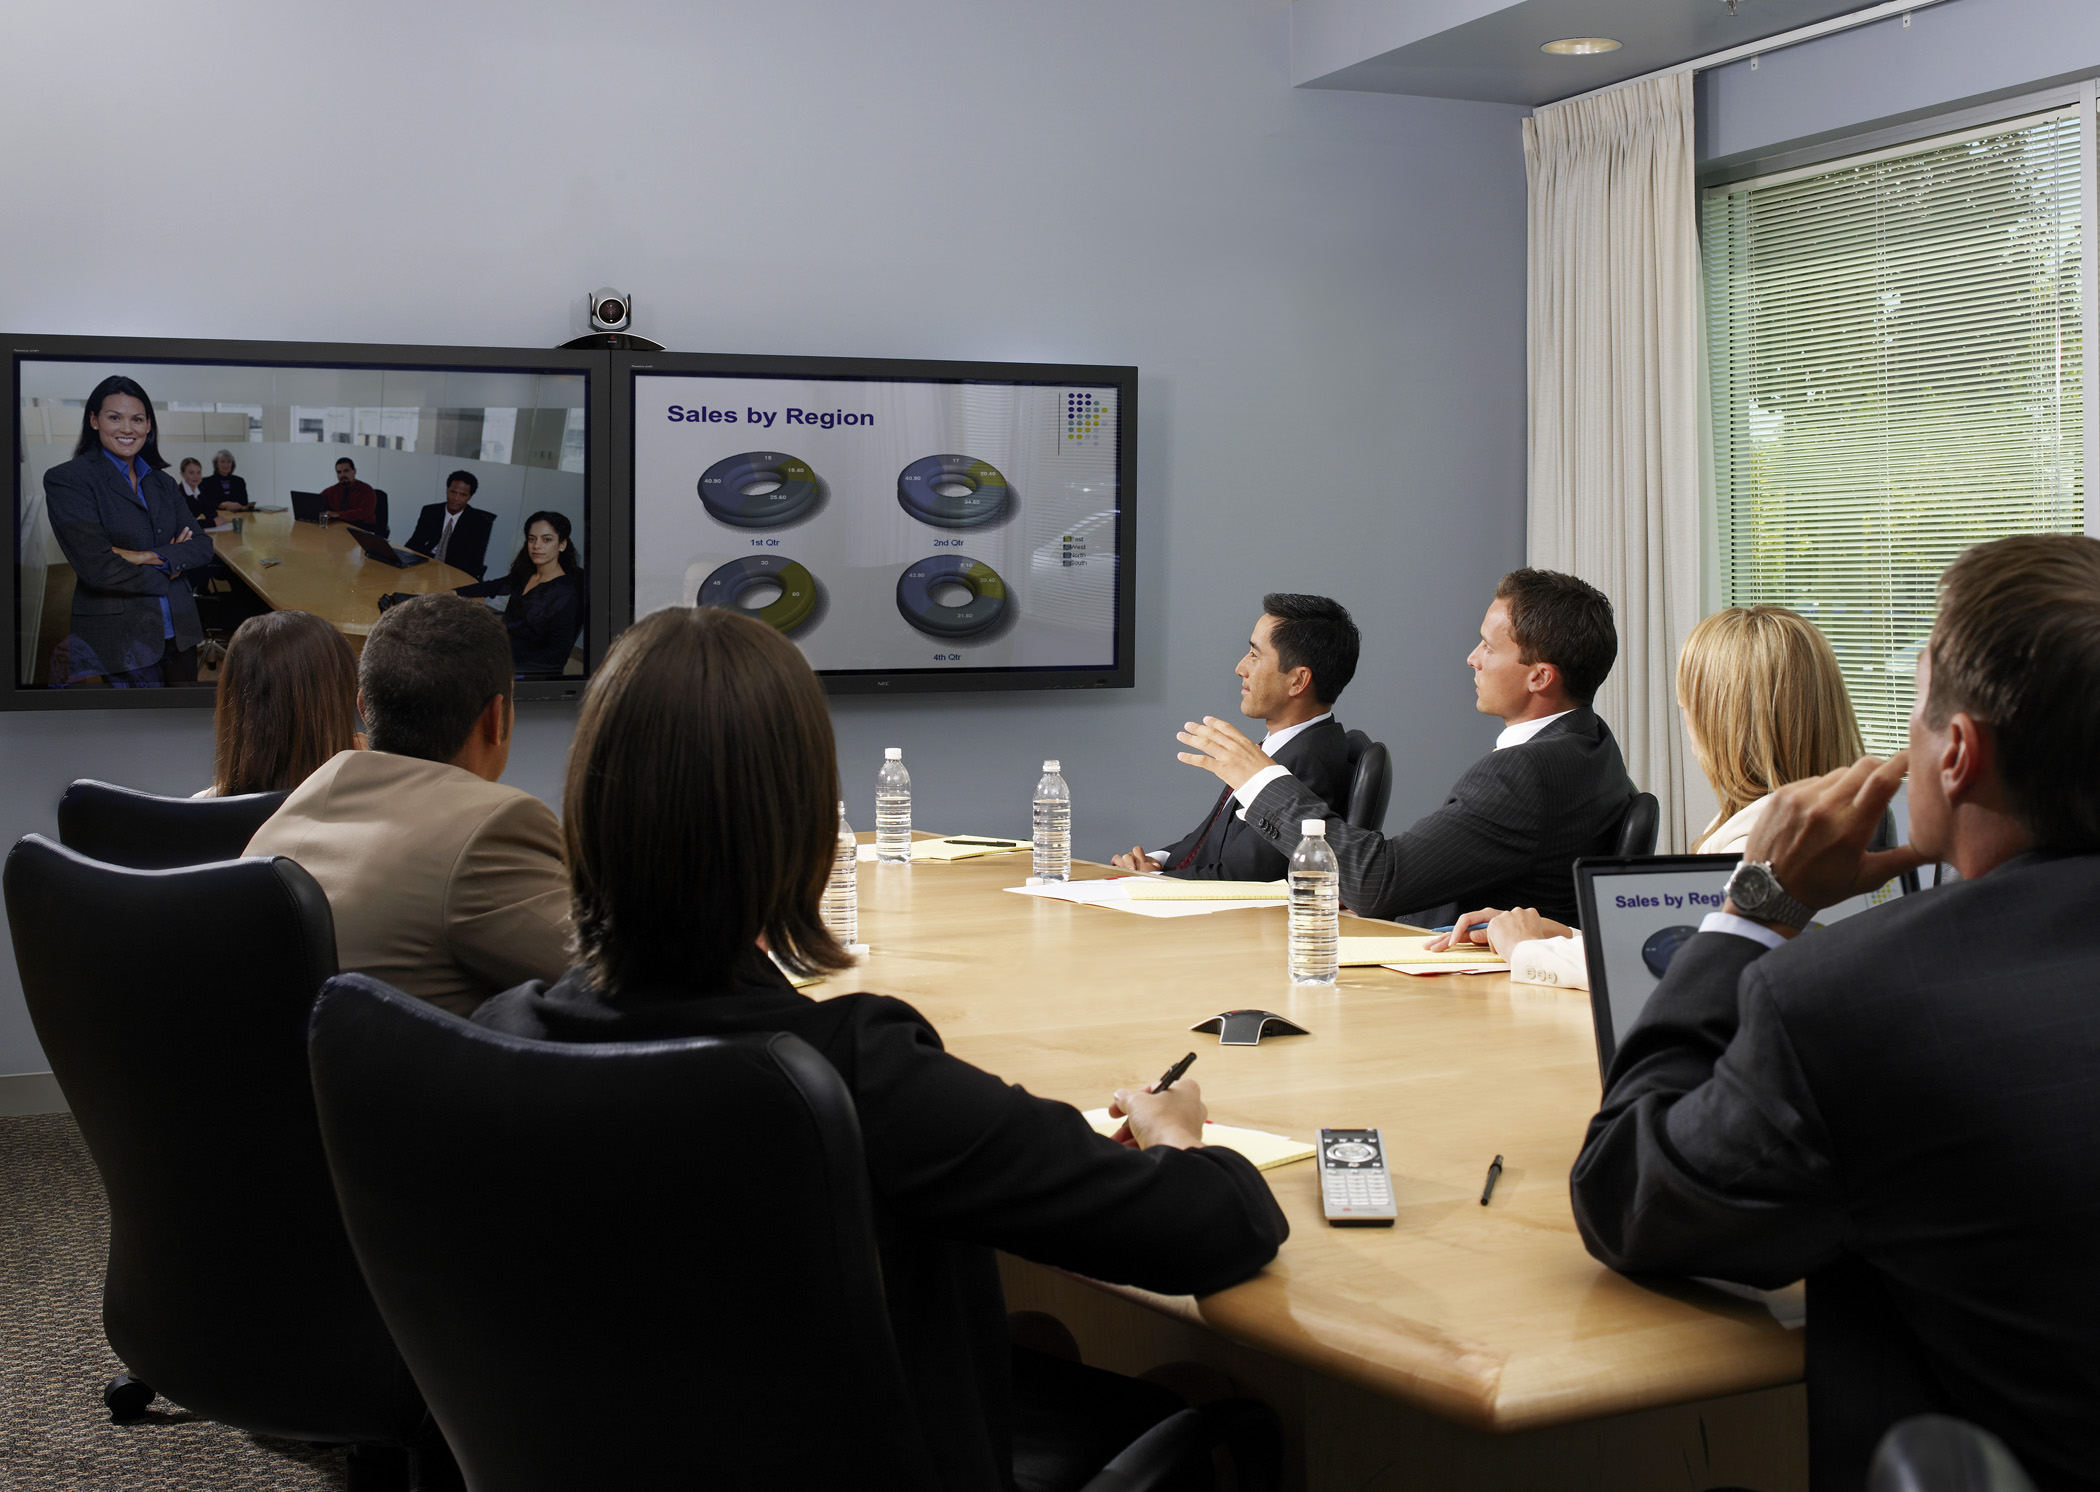 Video Conferencing Polycom And Tandberg Vs Skype